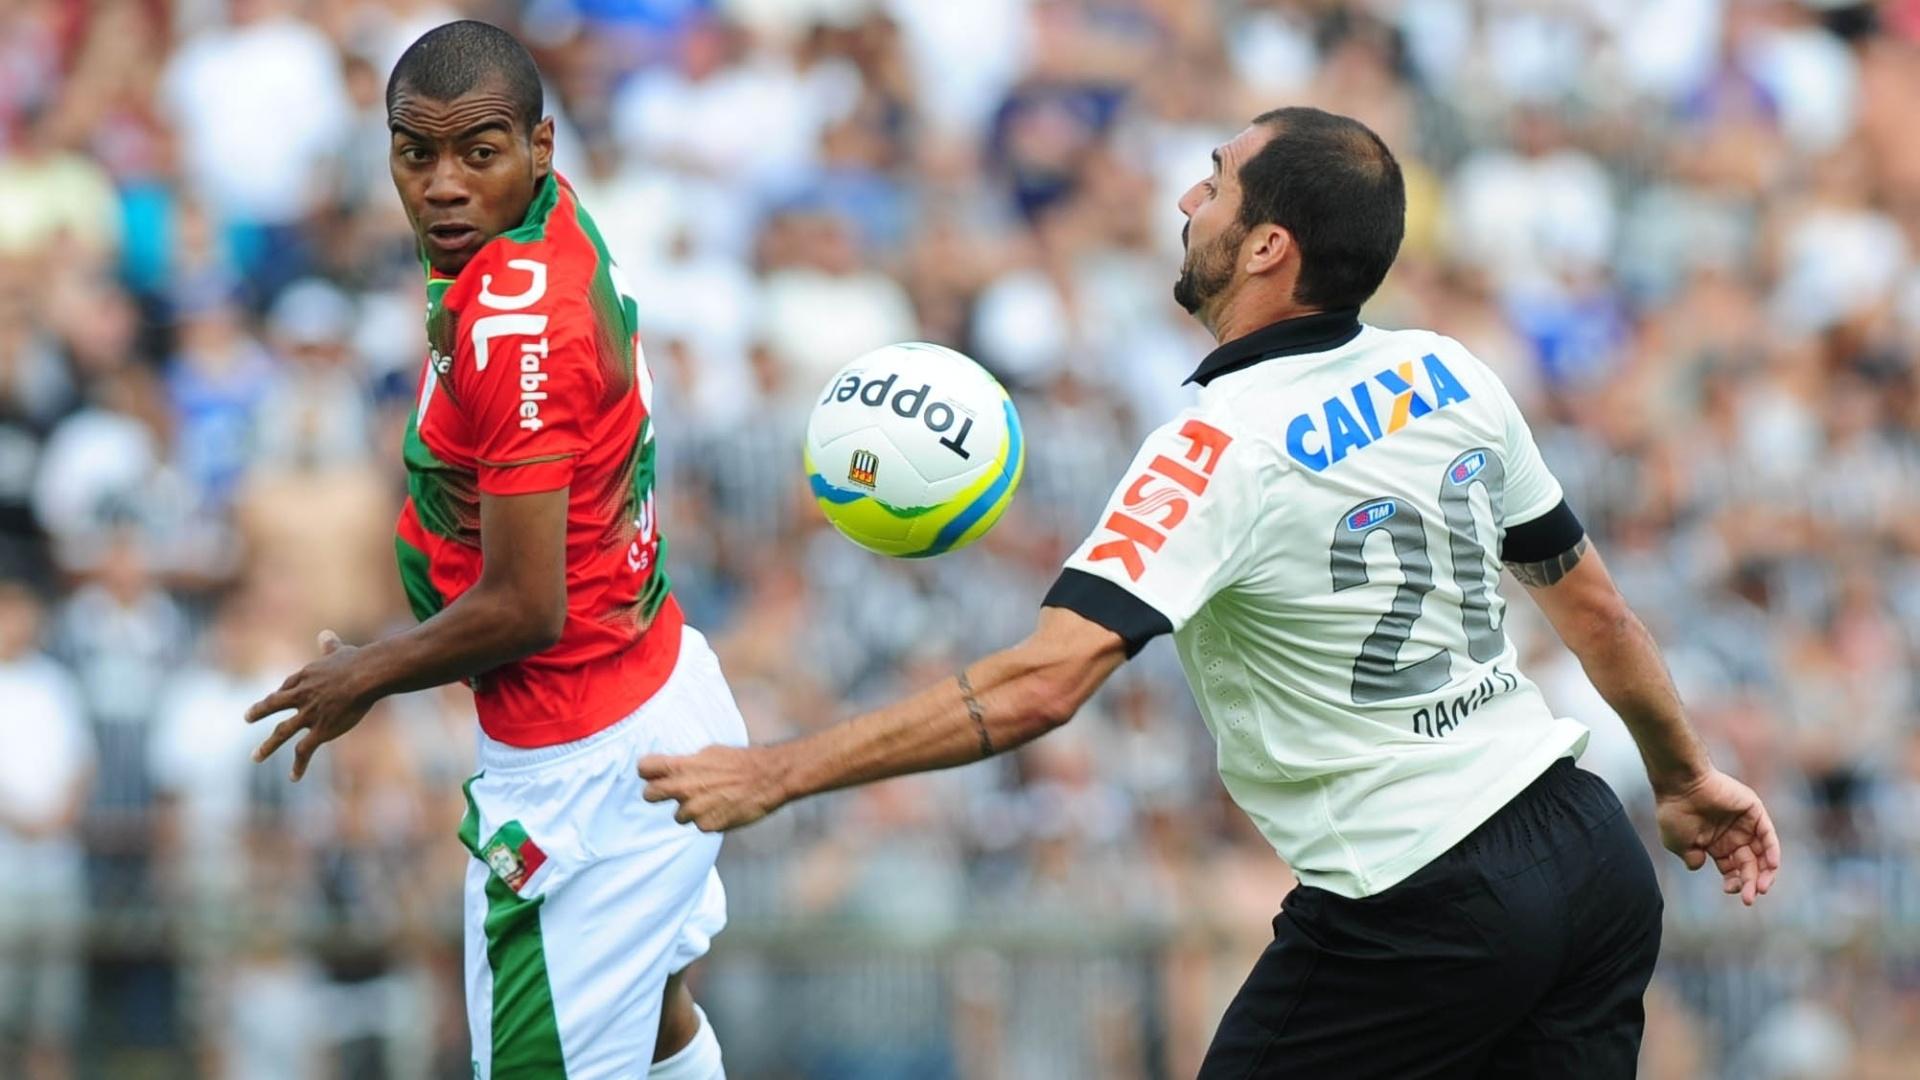 19.jan.2014 - Danilo domina a bola no peito enquanto é marcado de perto por jogador da Portuguesa